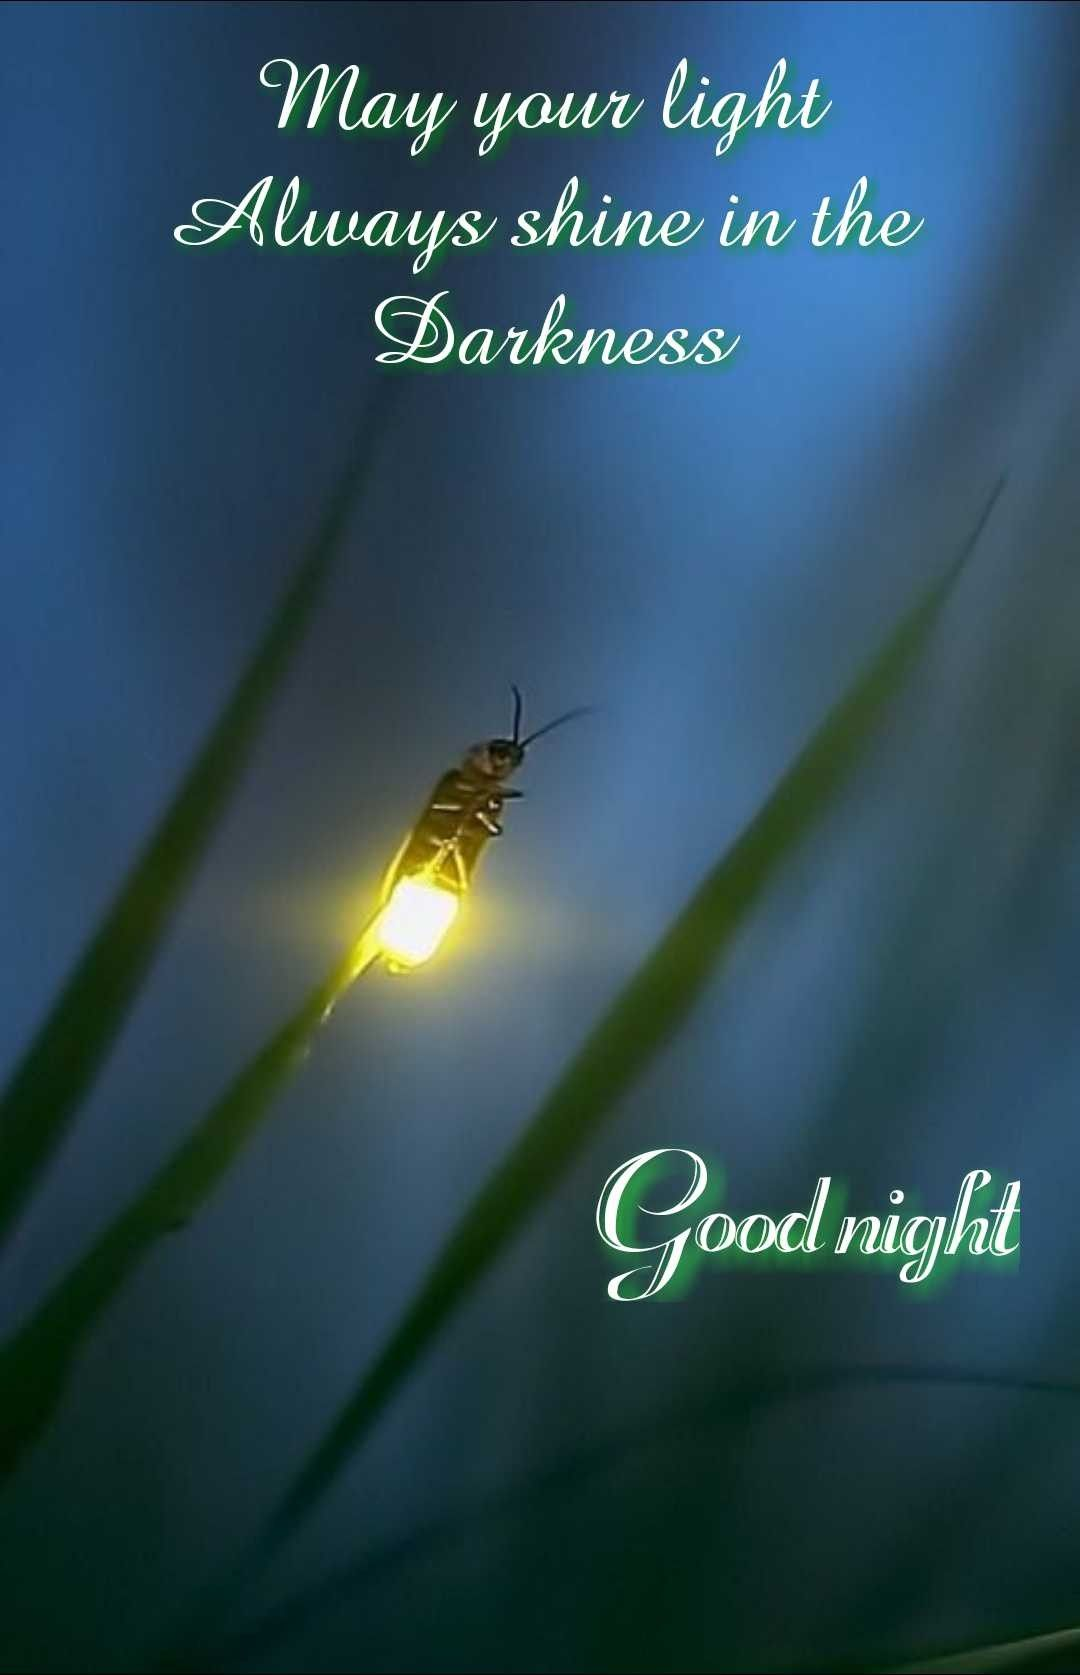 Have A Wonderful Evening My Friend Sleep Well Good Night Messages Good Night Qoutes Good Night